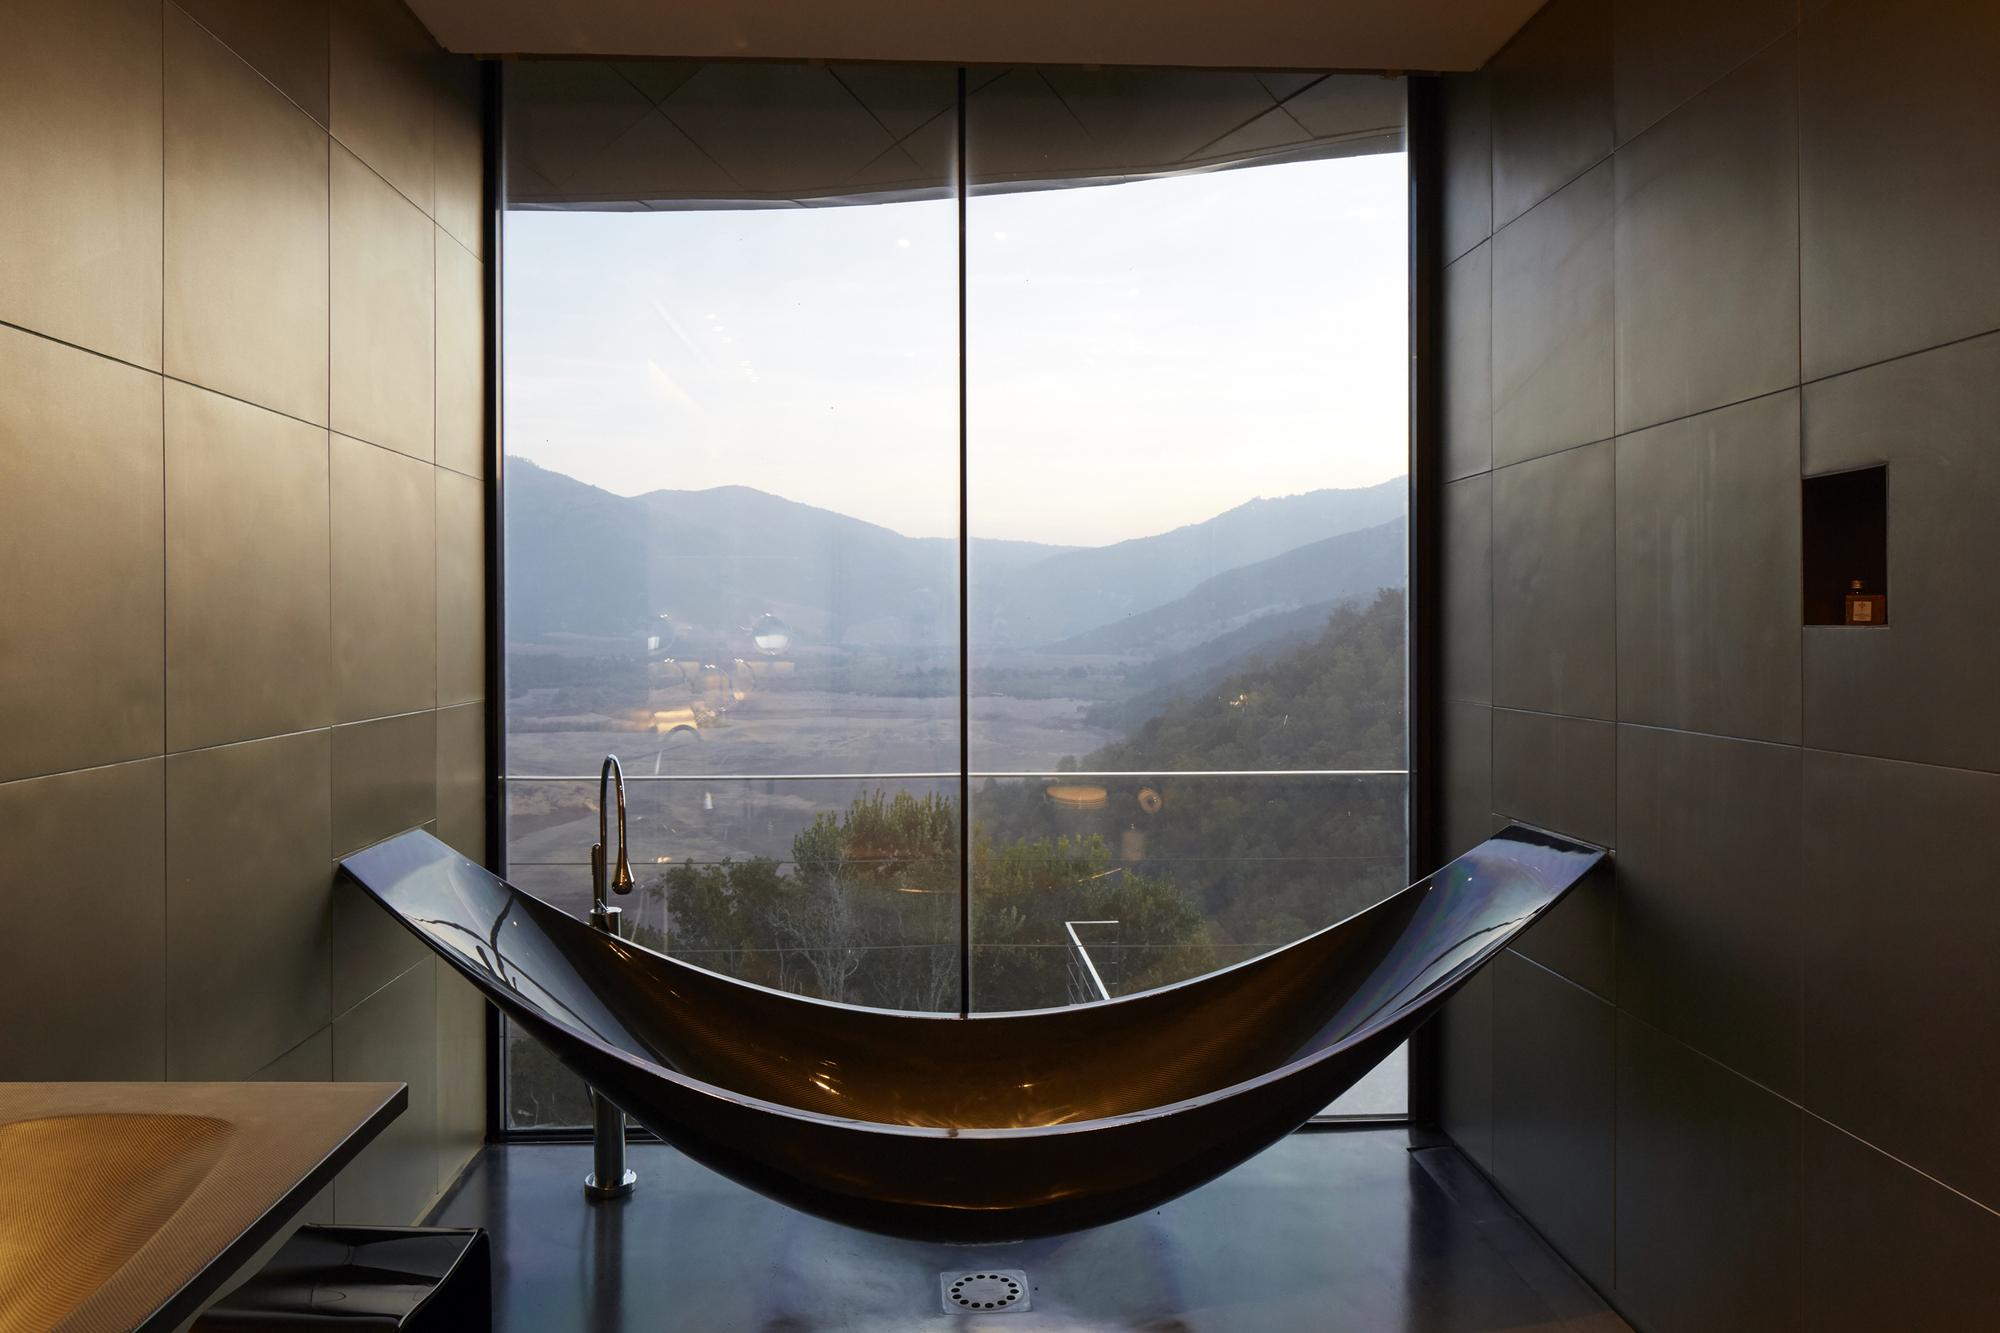 Ct Bath And Shower Gallery Of Vik Hotel Marcelo Daglio Arquitectos 7